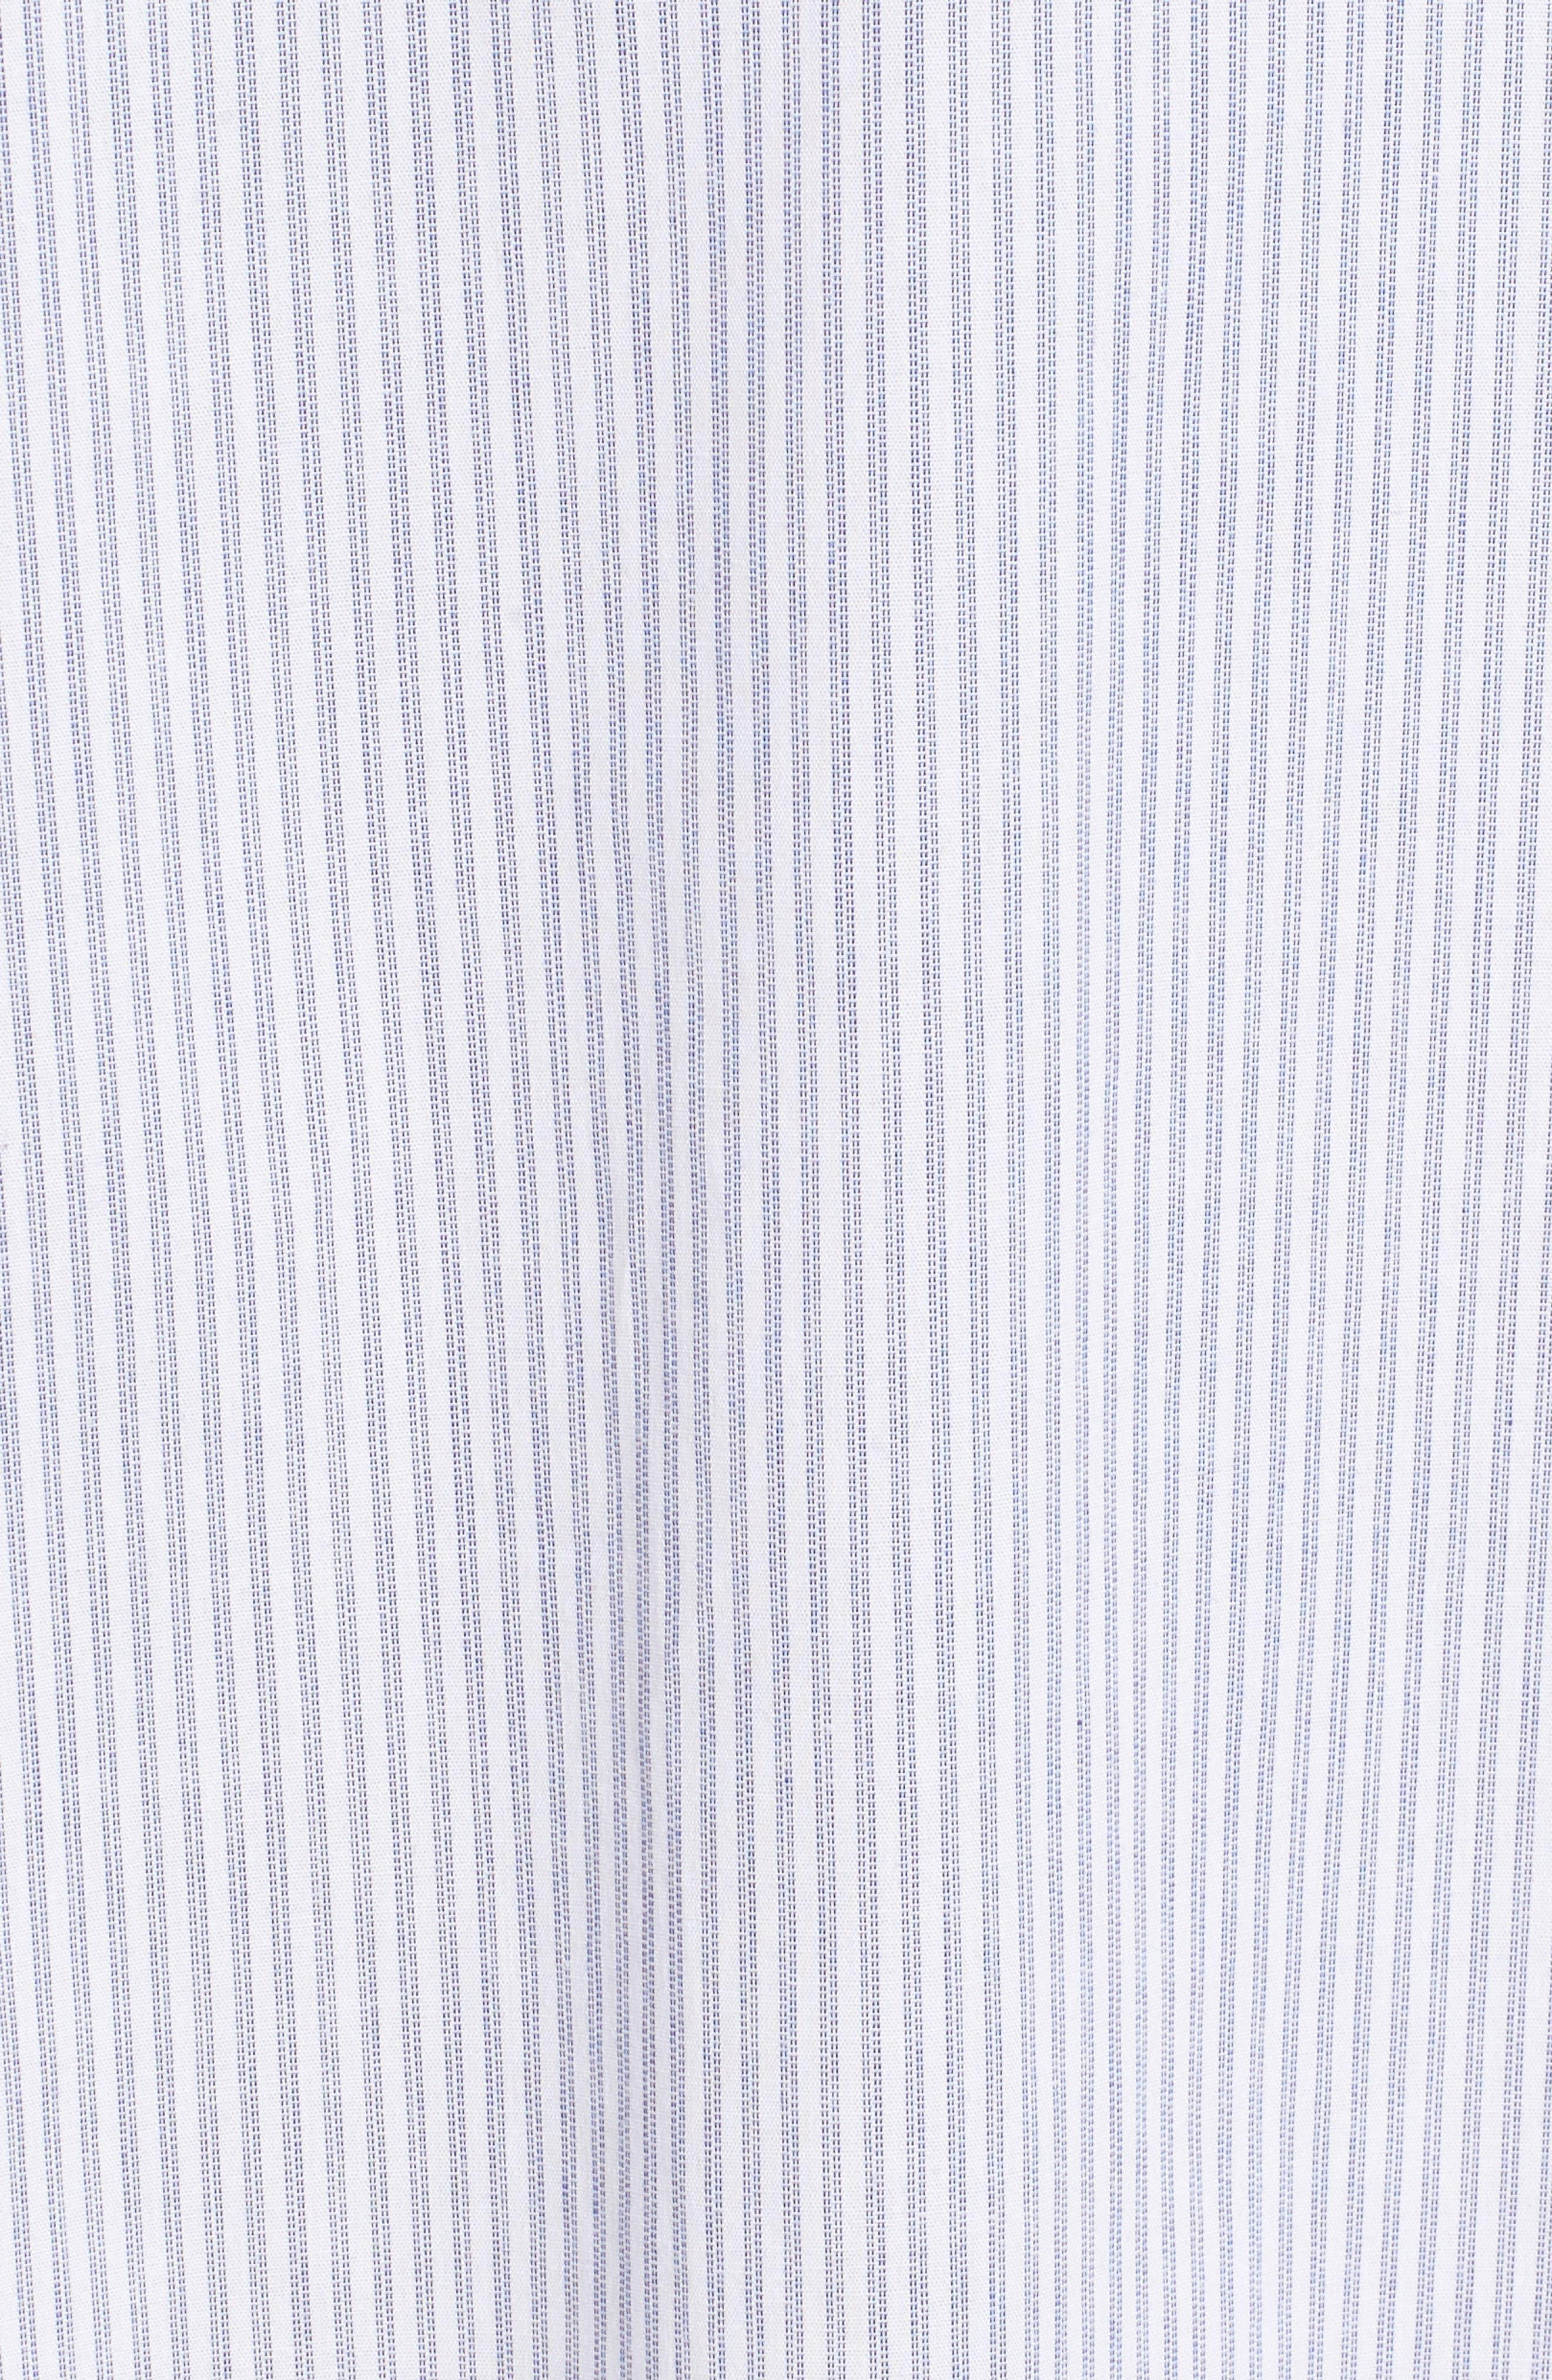 Embroidered Poplin Dress,                             Alternate thumbnail 6, color,                             White/ Blue